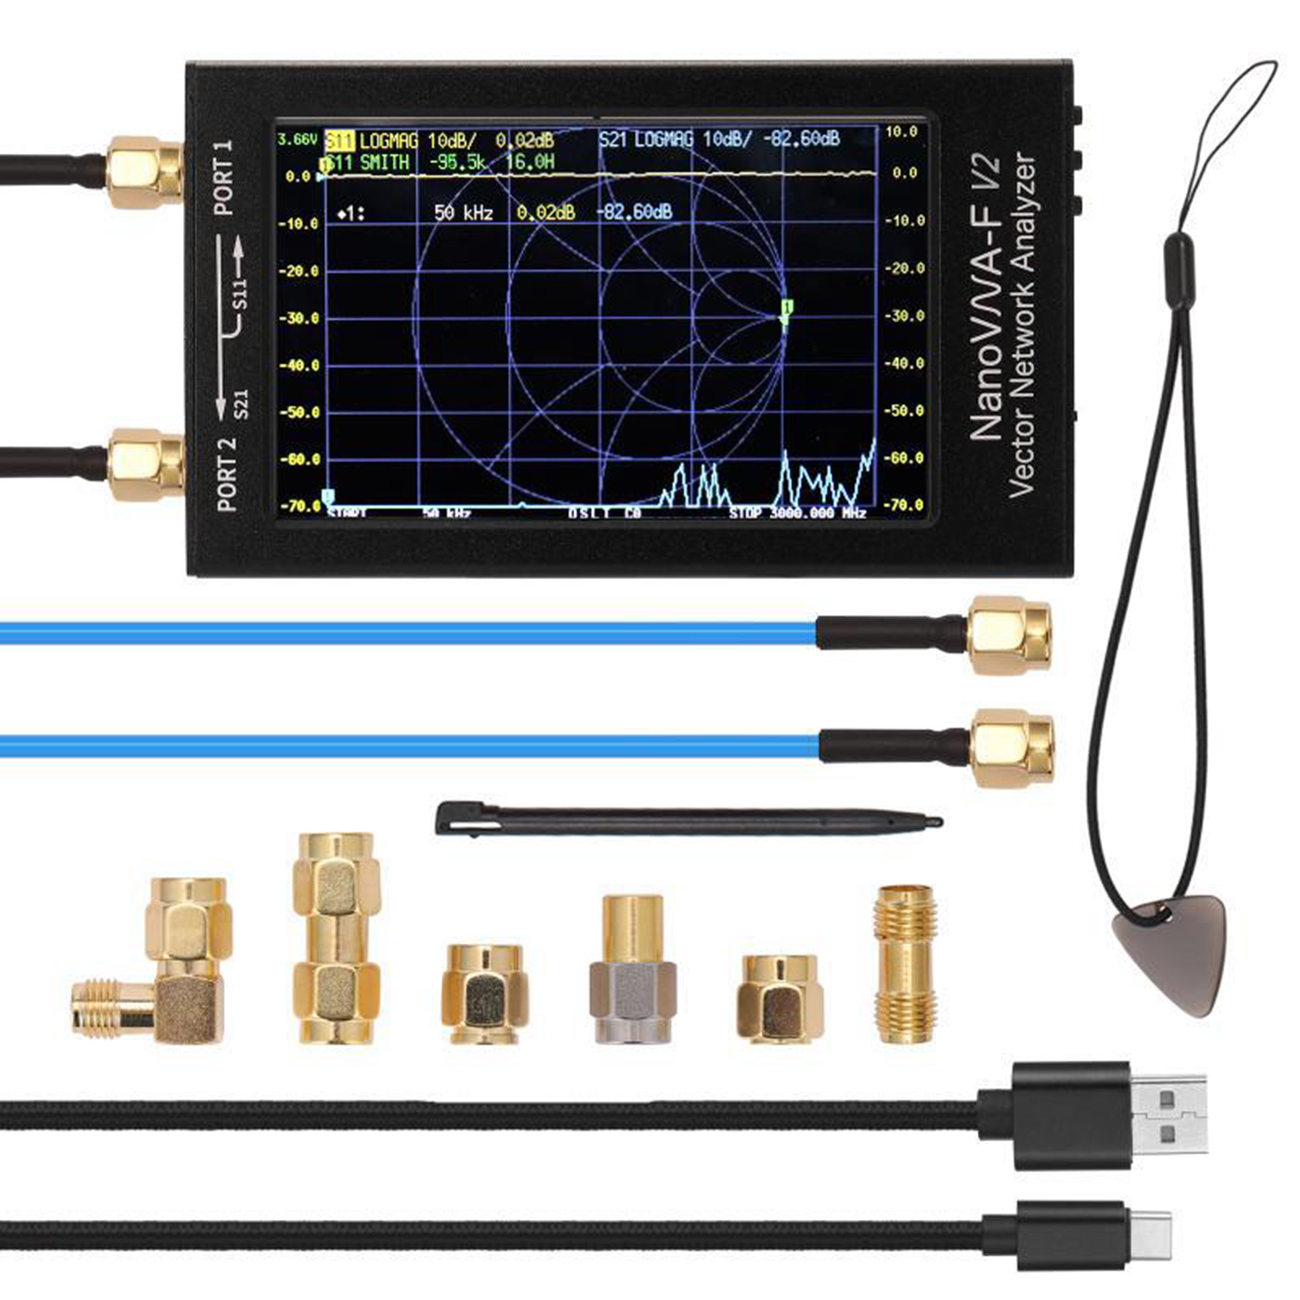 Векторный анализатор сети Ips S-A-A-2 NanoVNA V2, цифровой нано-анализатор, тестер MF HF VHF UHF USB, анализатор логической антенны, стоячей волны